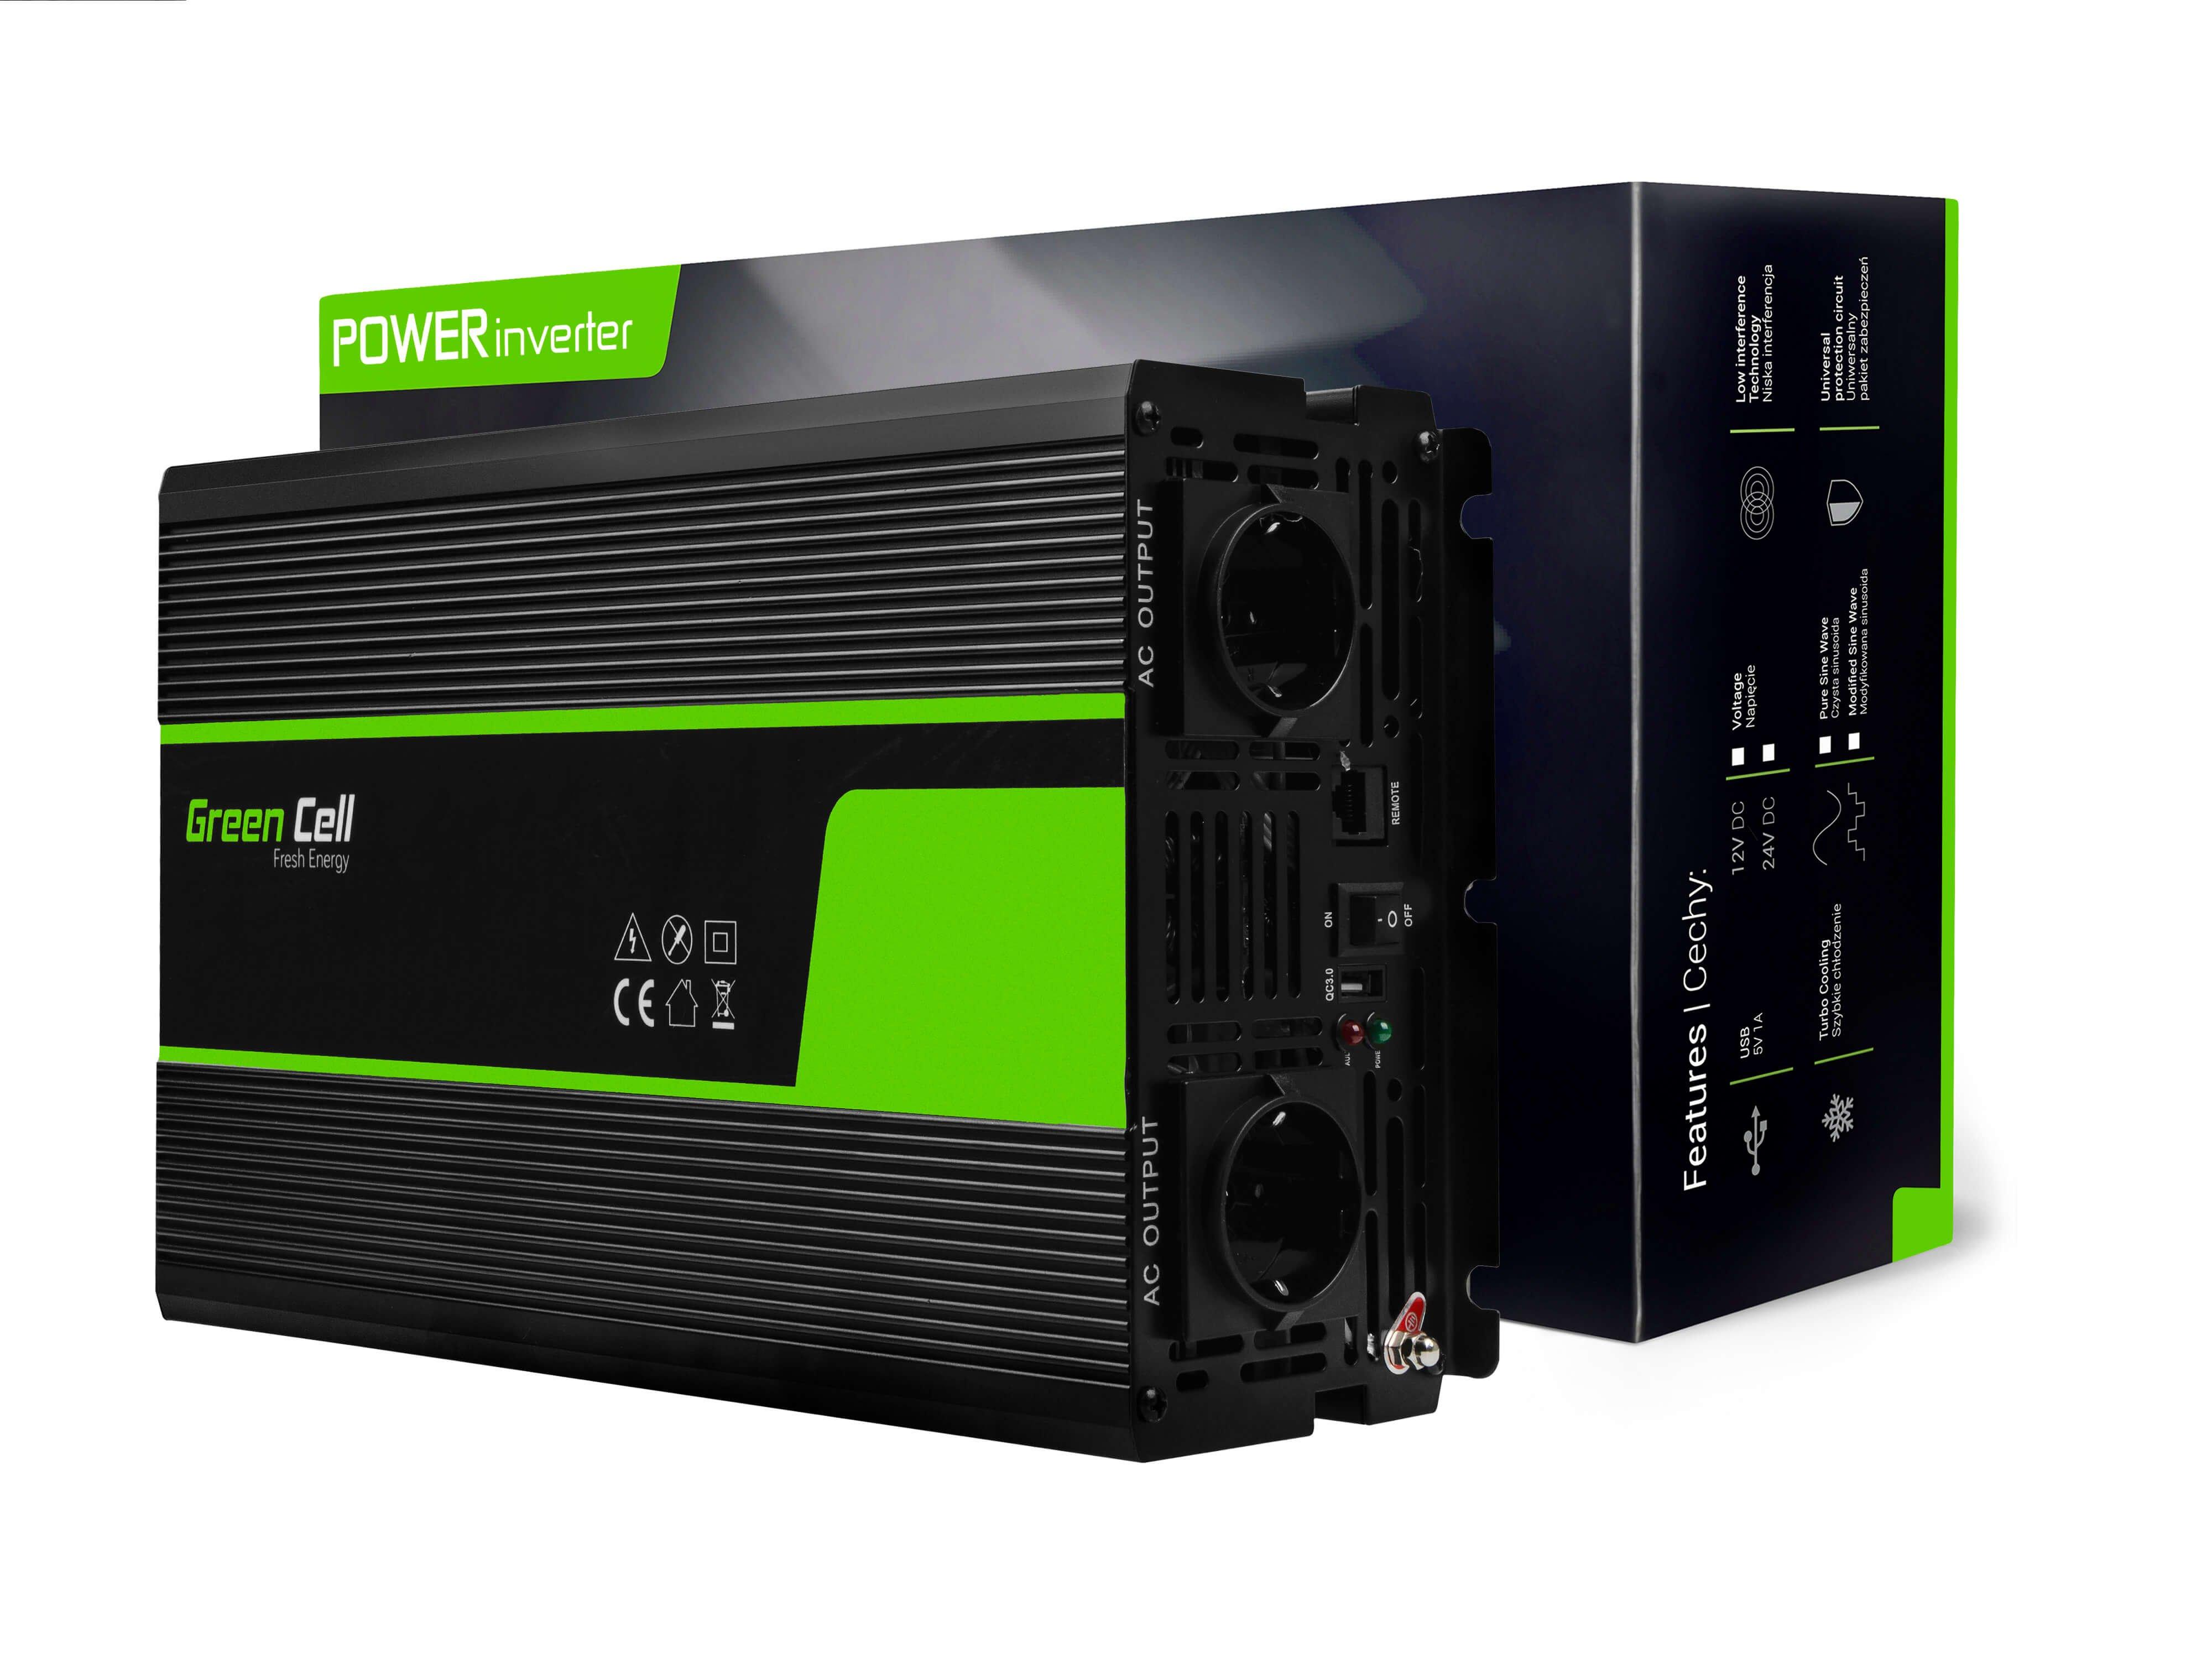 Green Cell Měnič napětí z 12V na 230V, 1500W | 3000W - čistá sinusovka